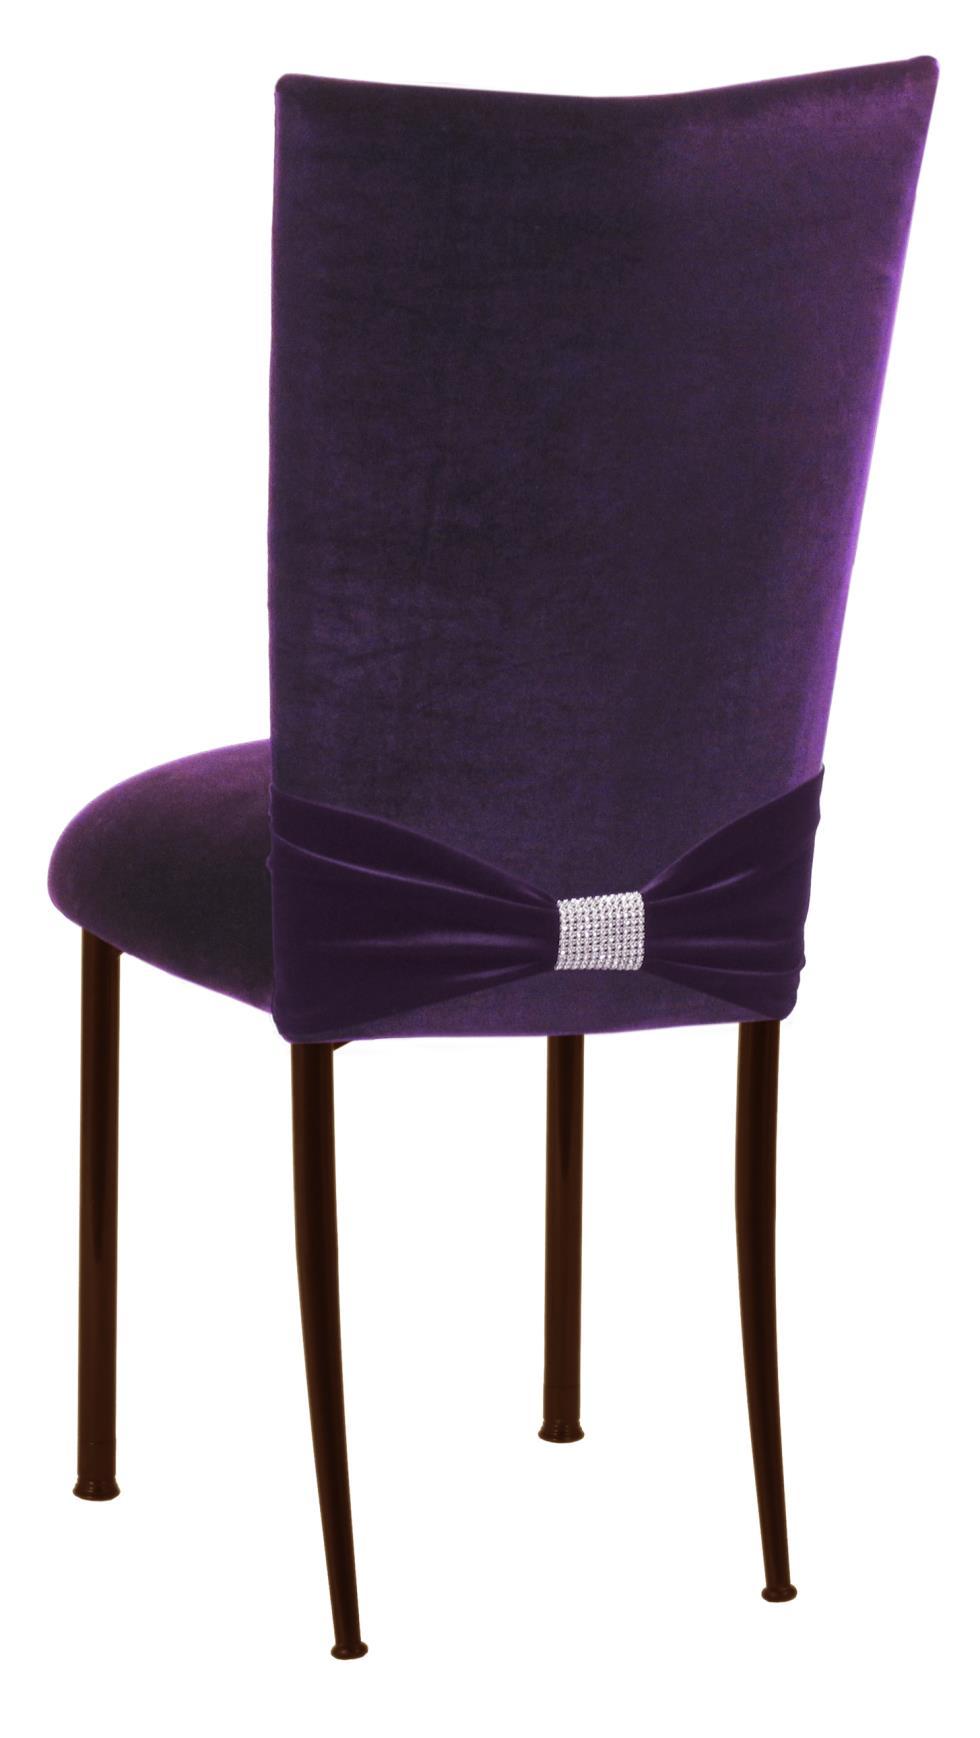 Chameleon Chair Velvet Covers Rentals Bright Rentals